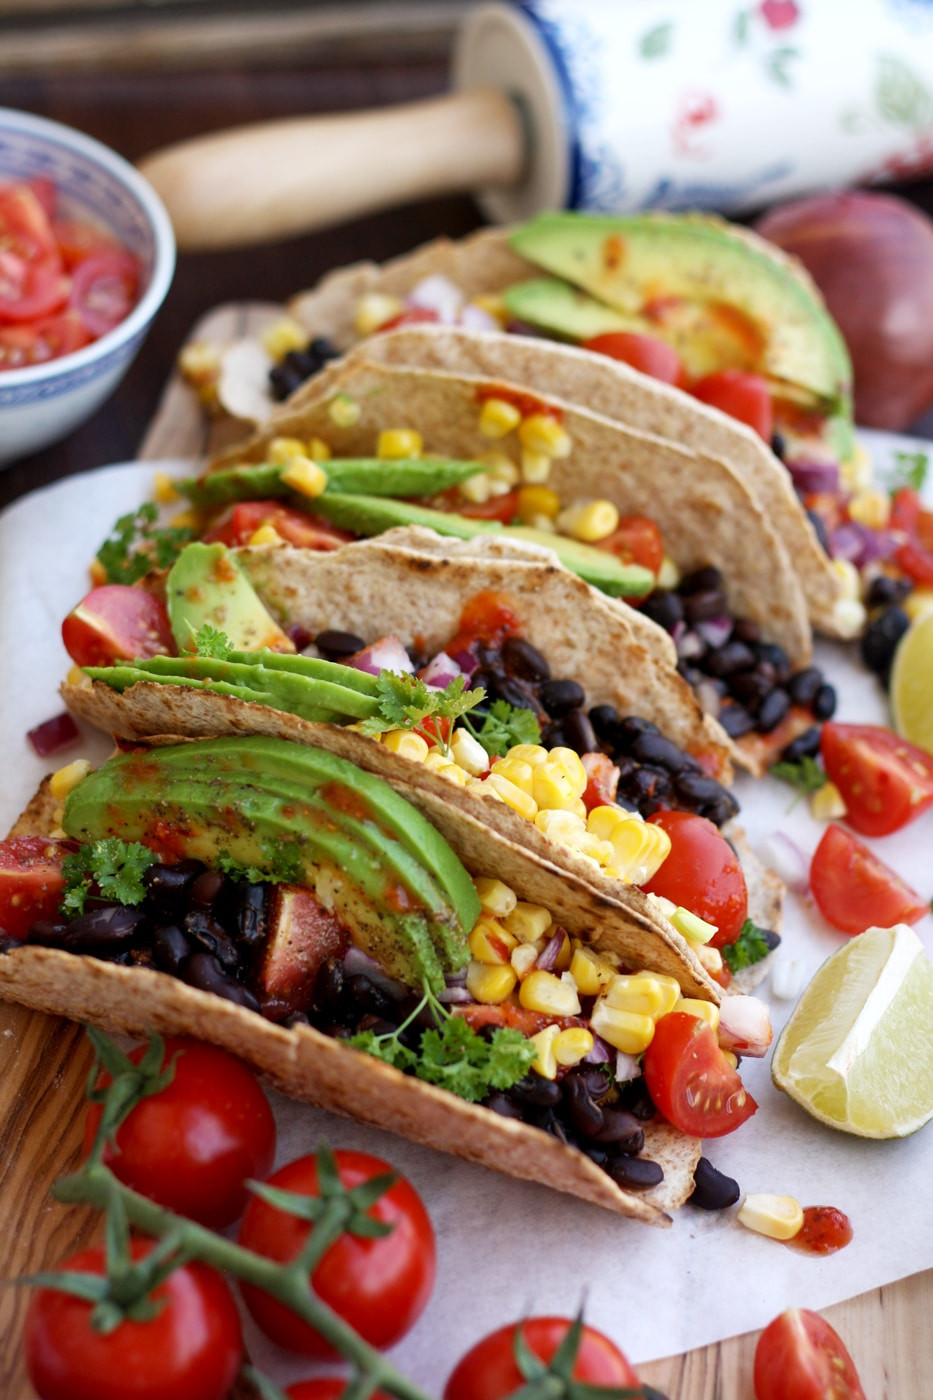 Quick And Easy Vegan Recipes  5 minute Easy Vegan Tacos • Happy Kitchen